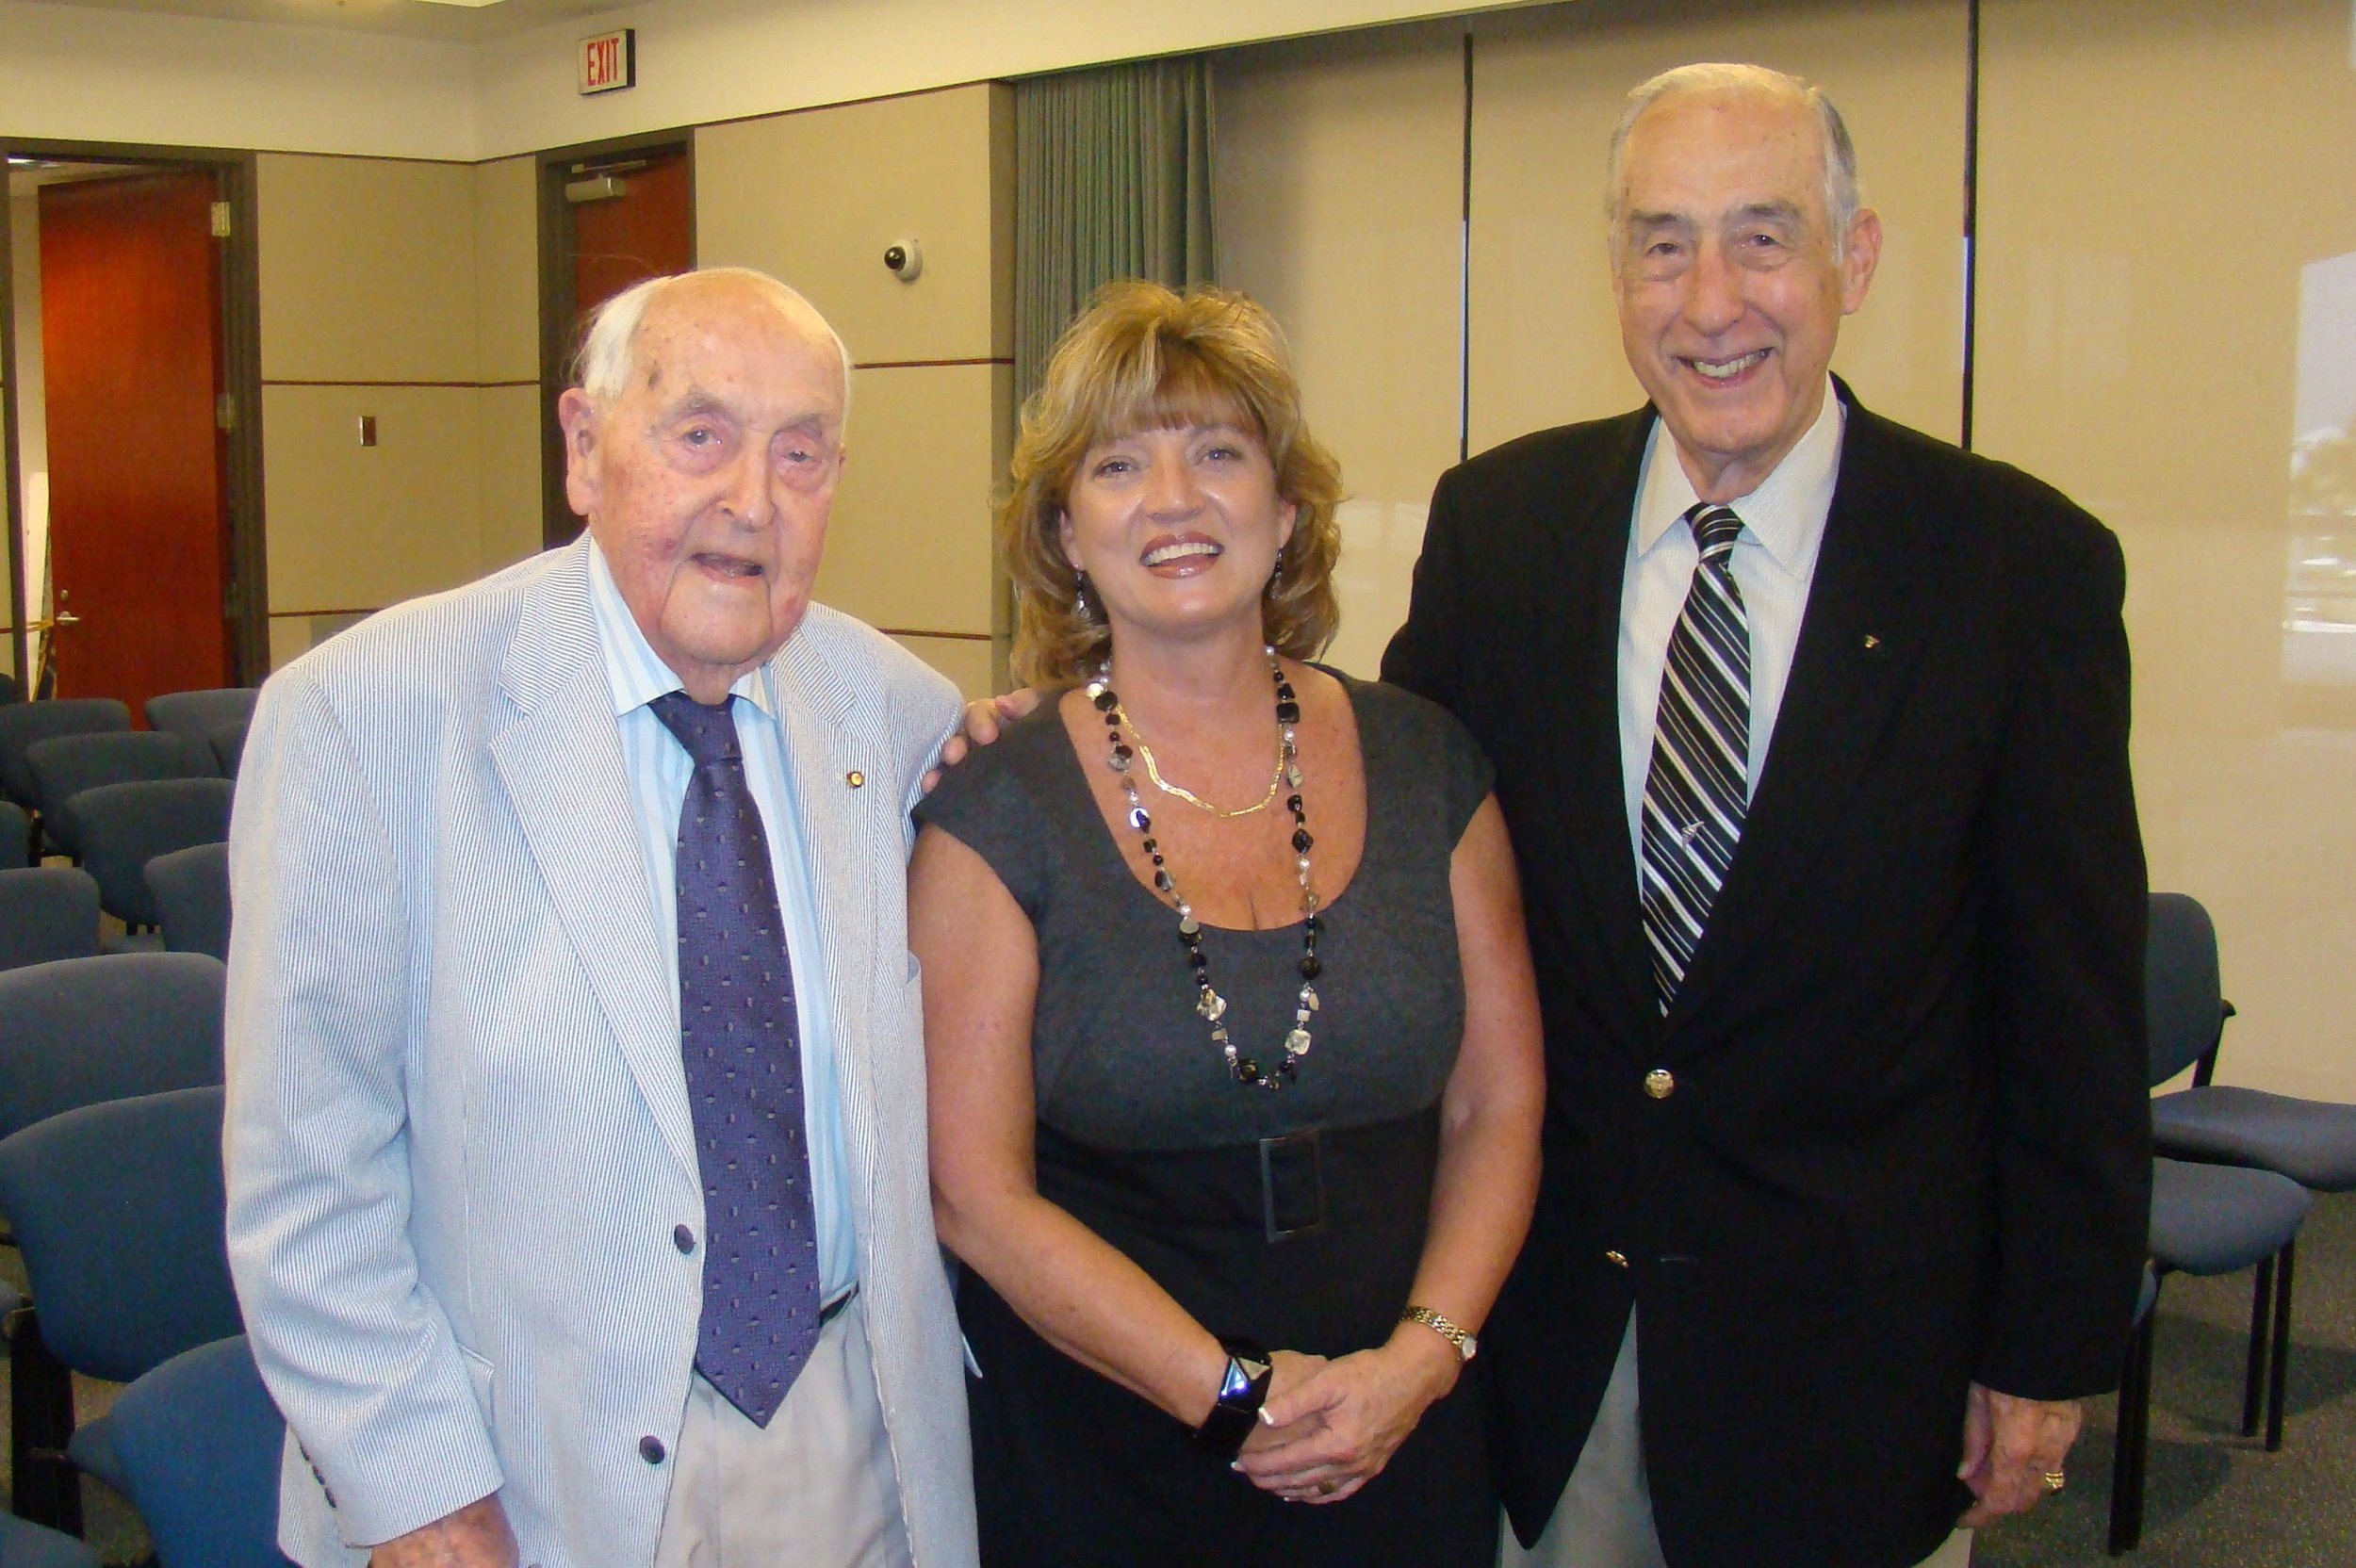 Sir Lenox, Colleen Picard & Dick Newton - 2, 27 Oct '11 - Copy.JPG